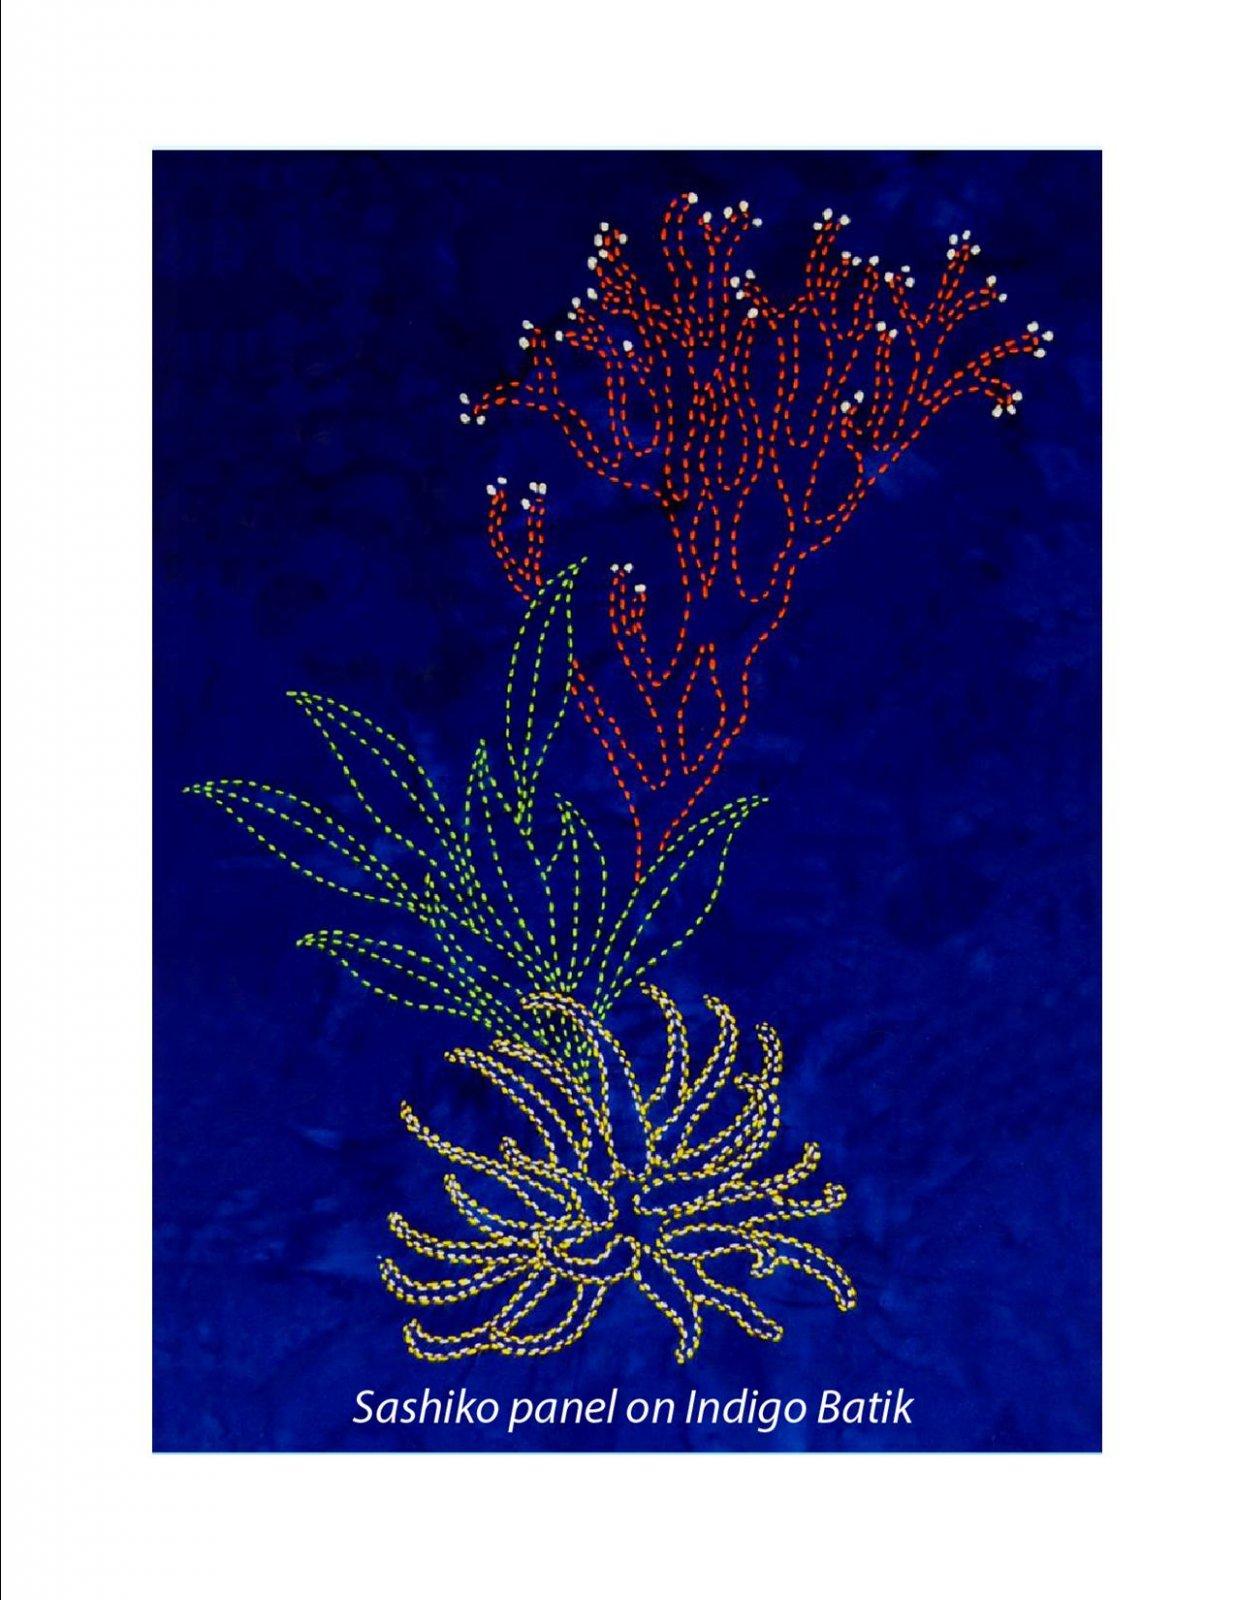 Coral Reef Anemones & Grasses Sashiko Panel